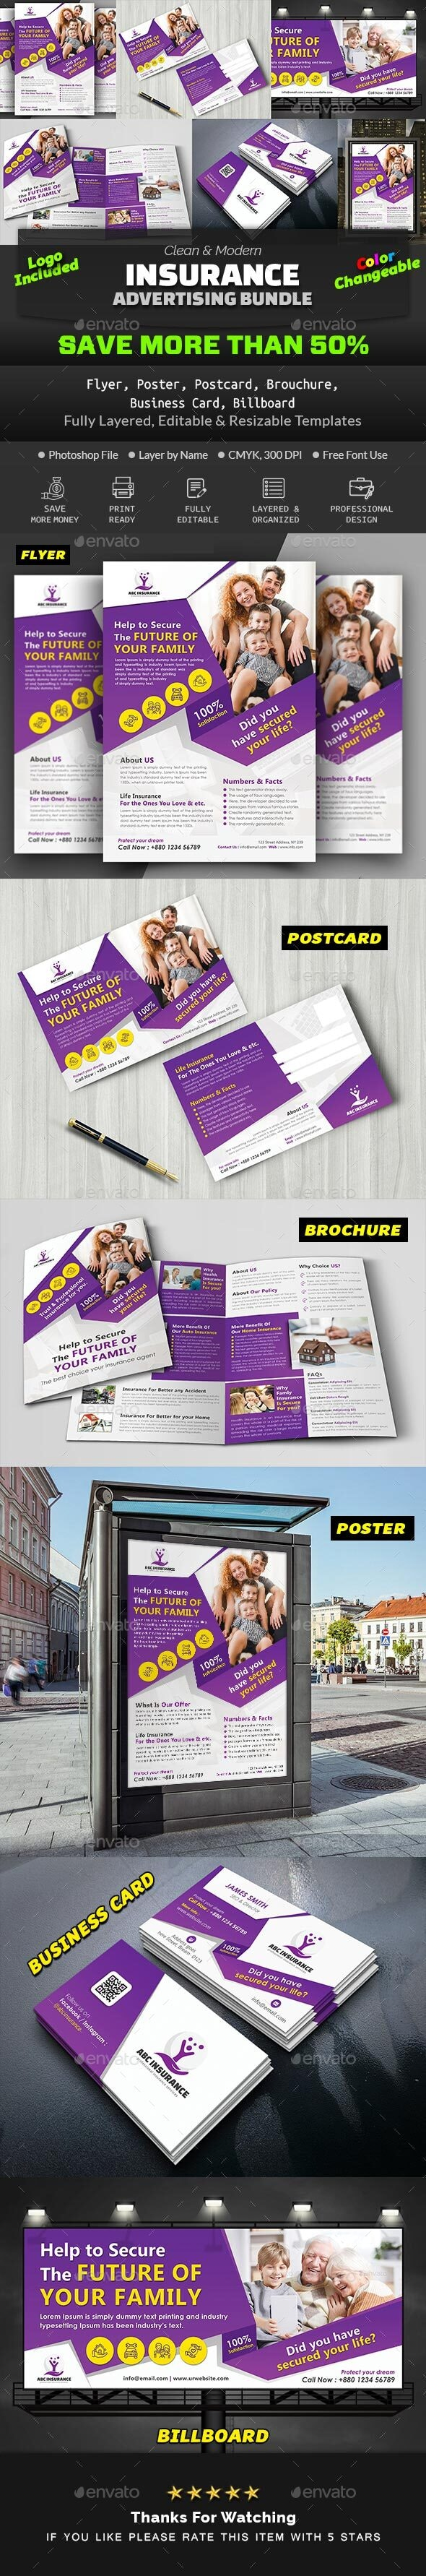 Insurance Advertising Bundle - Print Templates